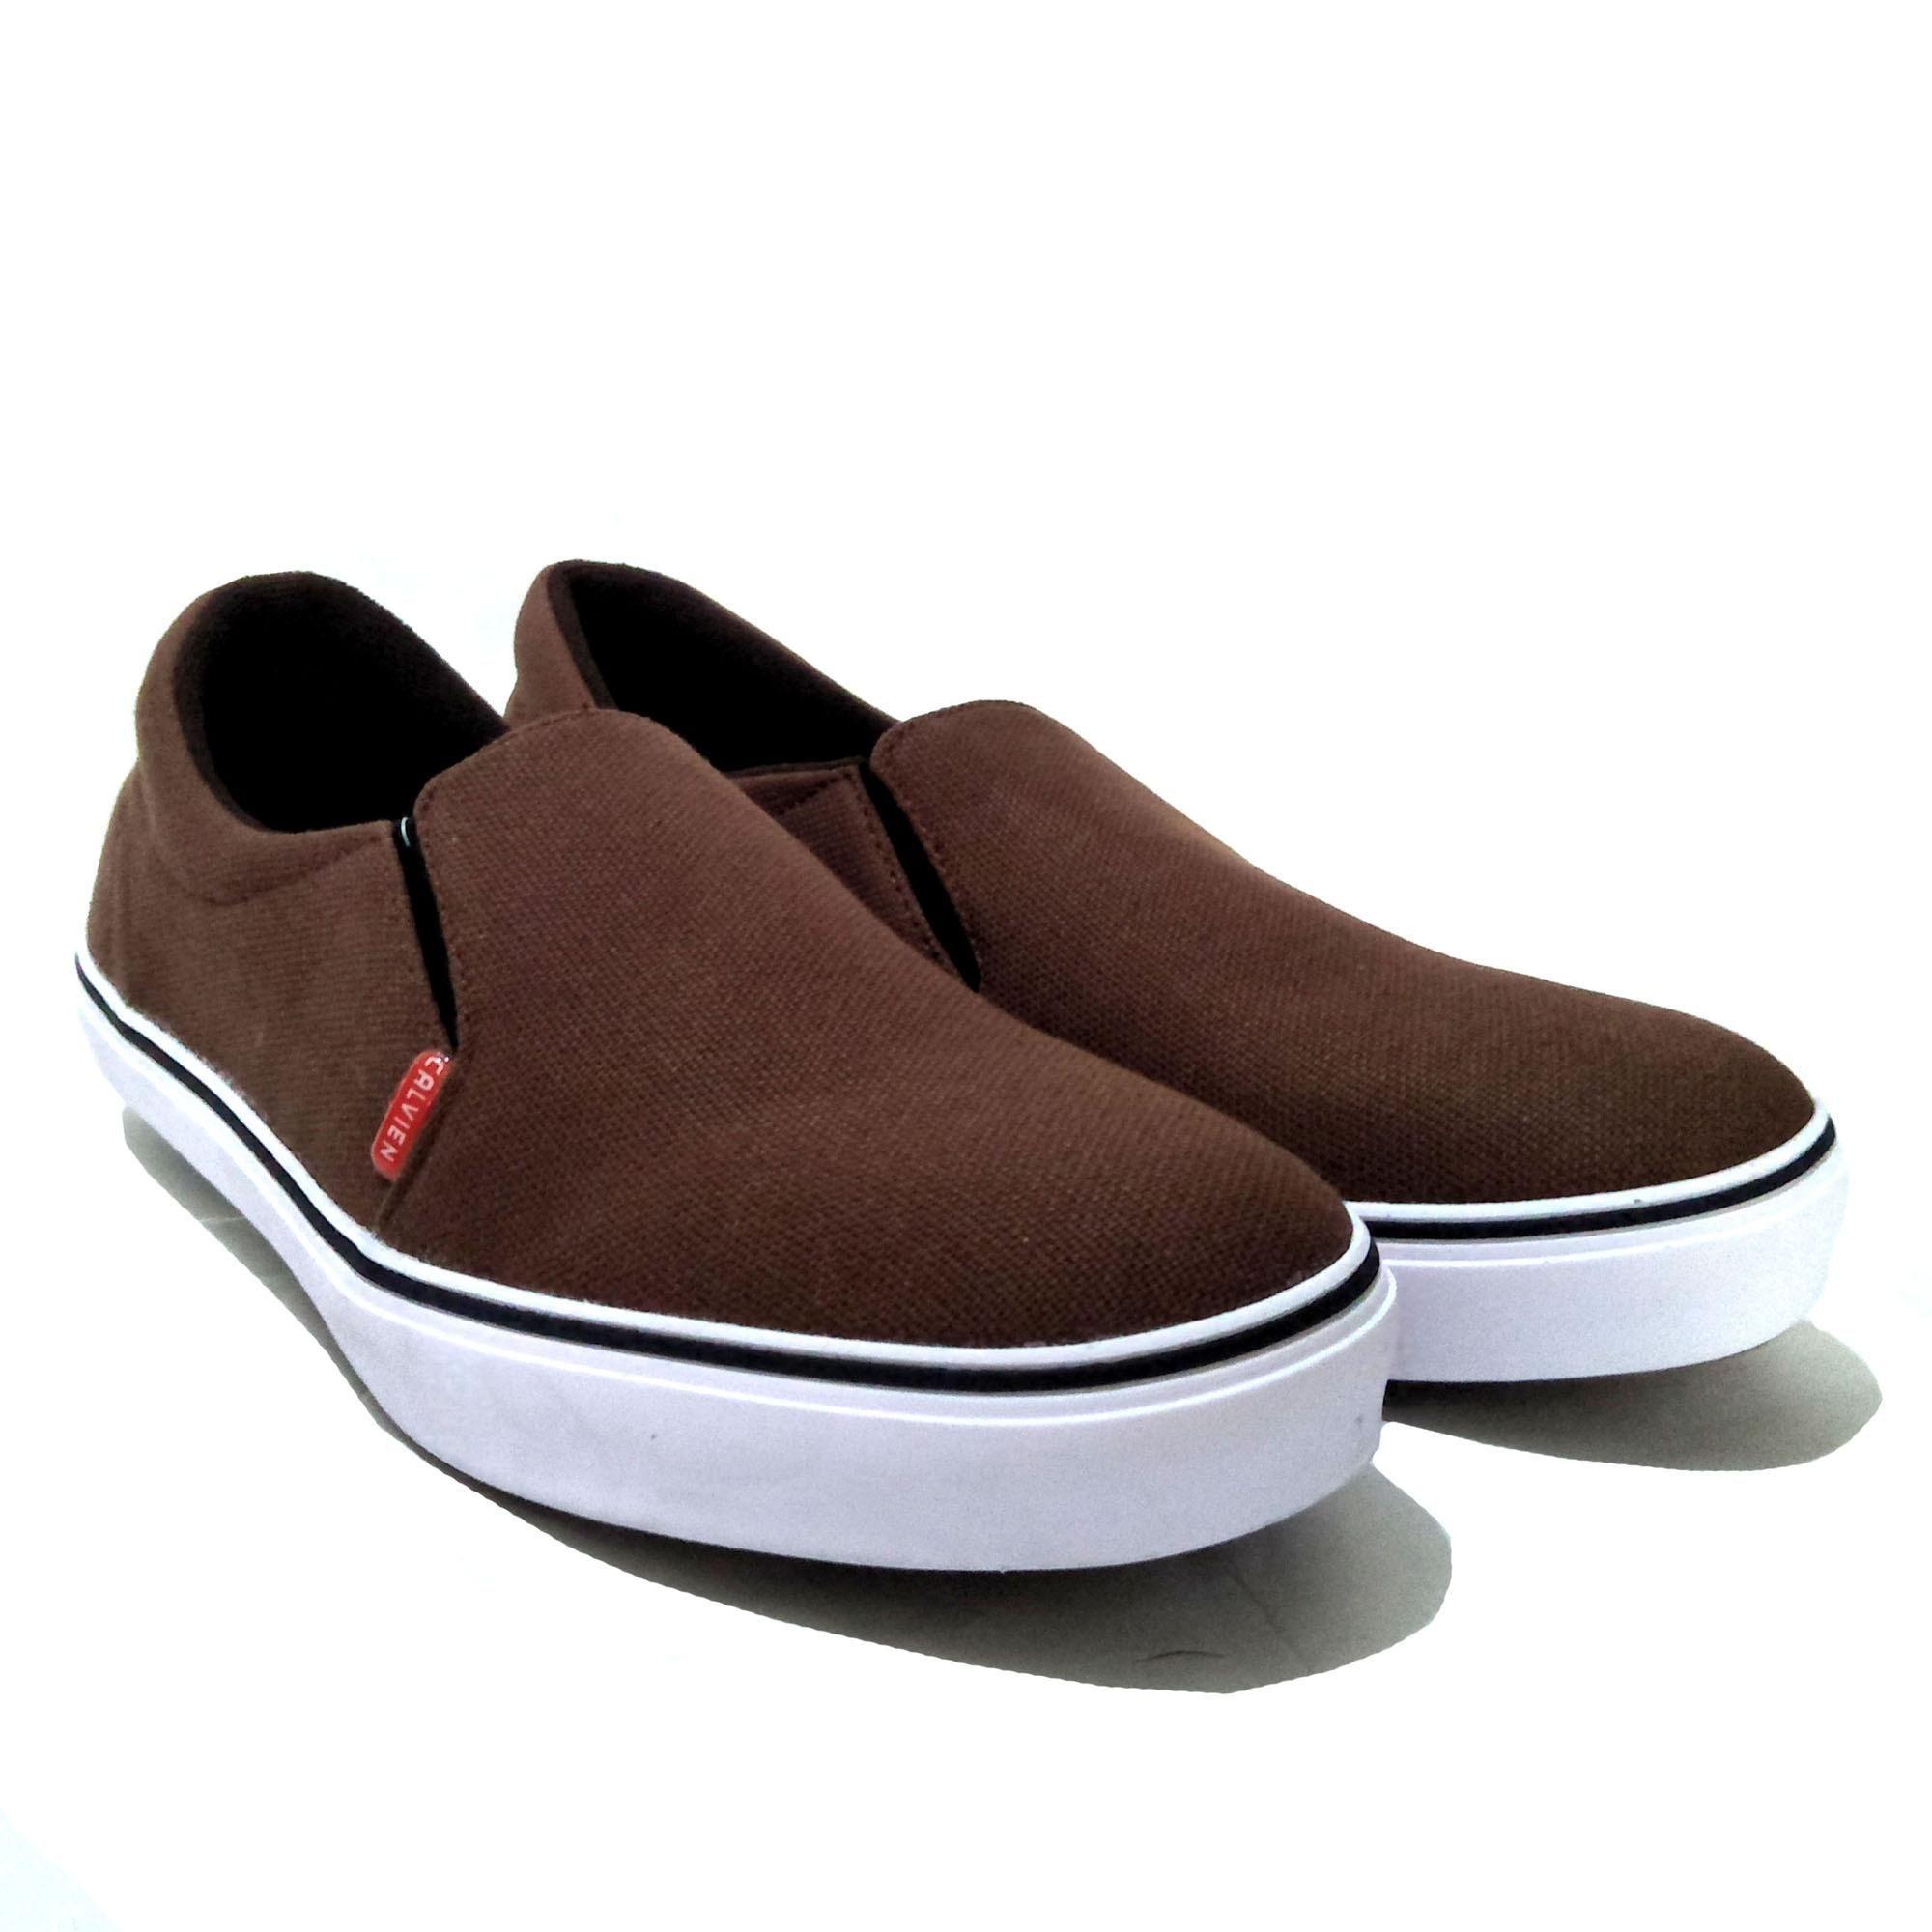 Calvien Sepatu Pria Slip Sepatu Pria Sneakers Sepatu Pria Kasual Sepatu Pria Murah Kode CL 06